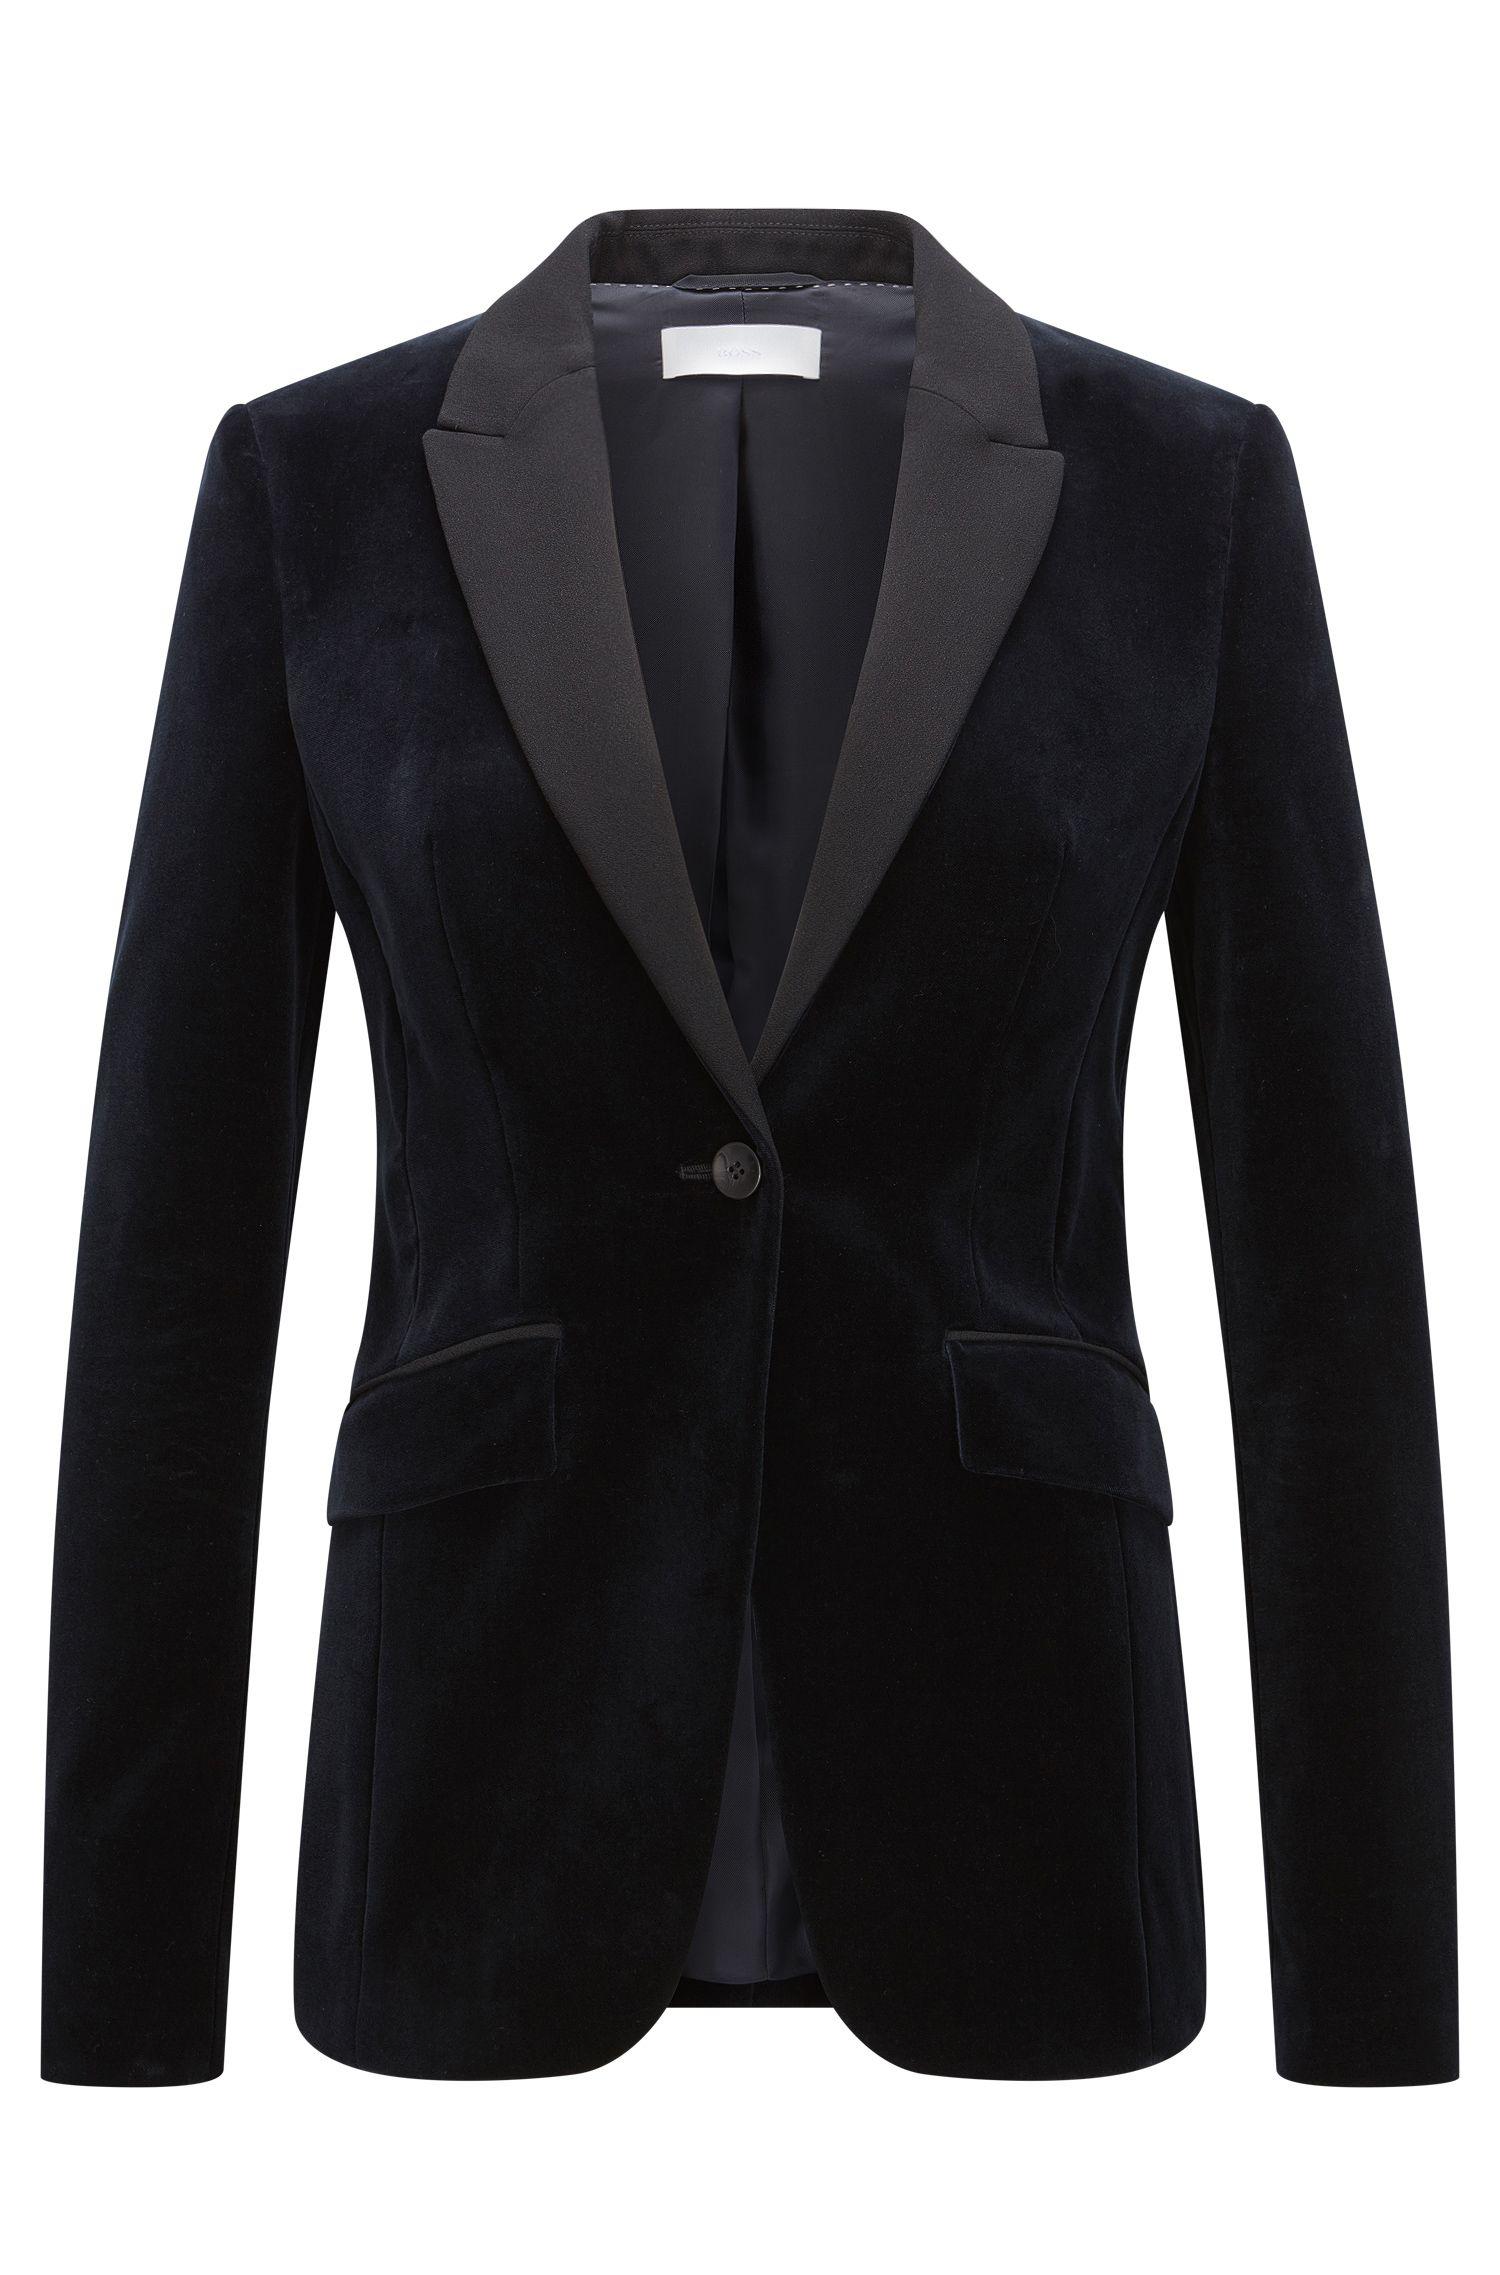 Velvet Tuxedo Jacket | Jeronala